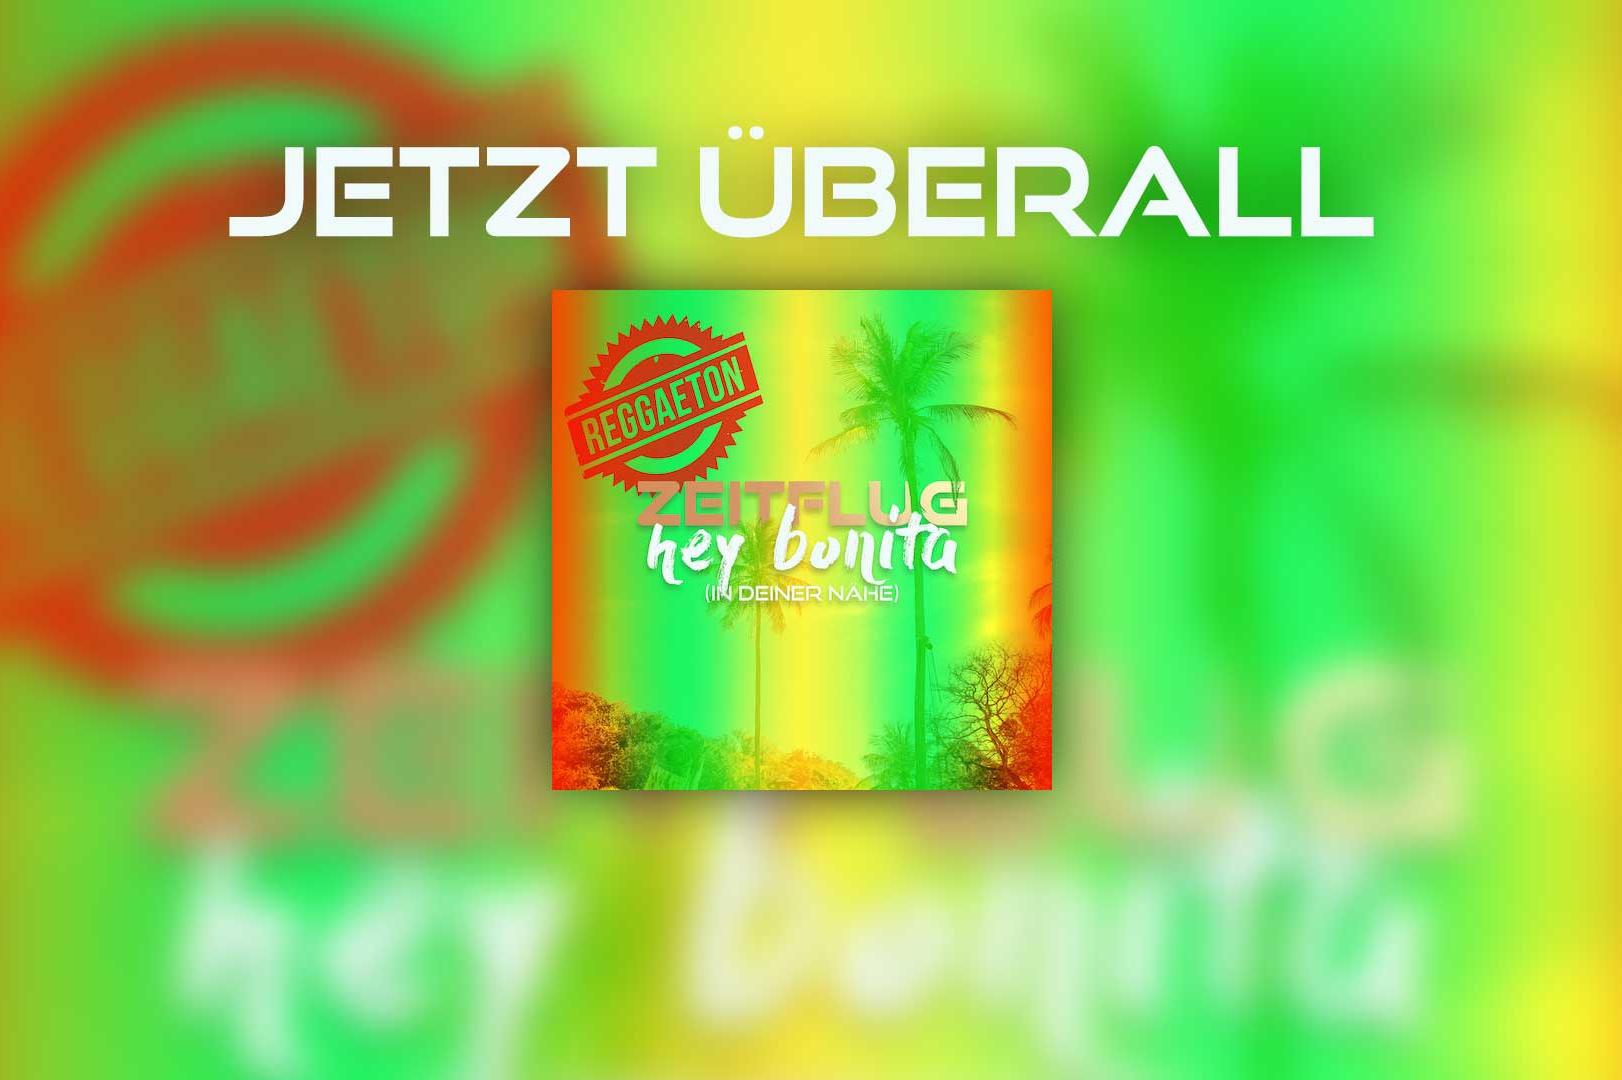 Hey Bonita (In Deiner Nähe) [Reggaeton Remix]